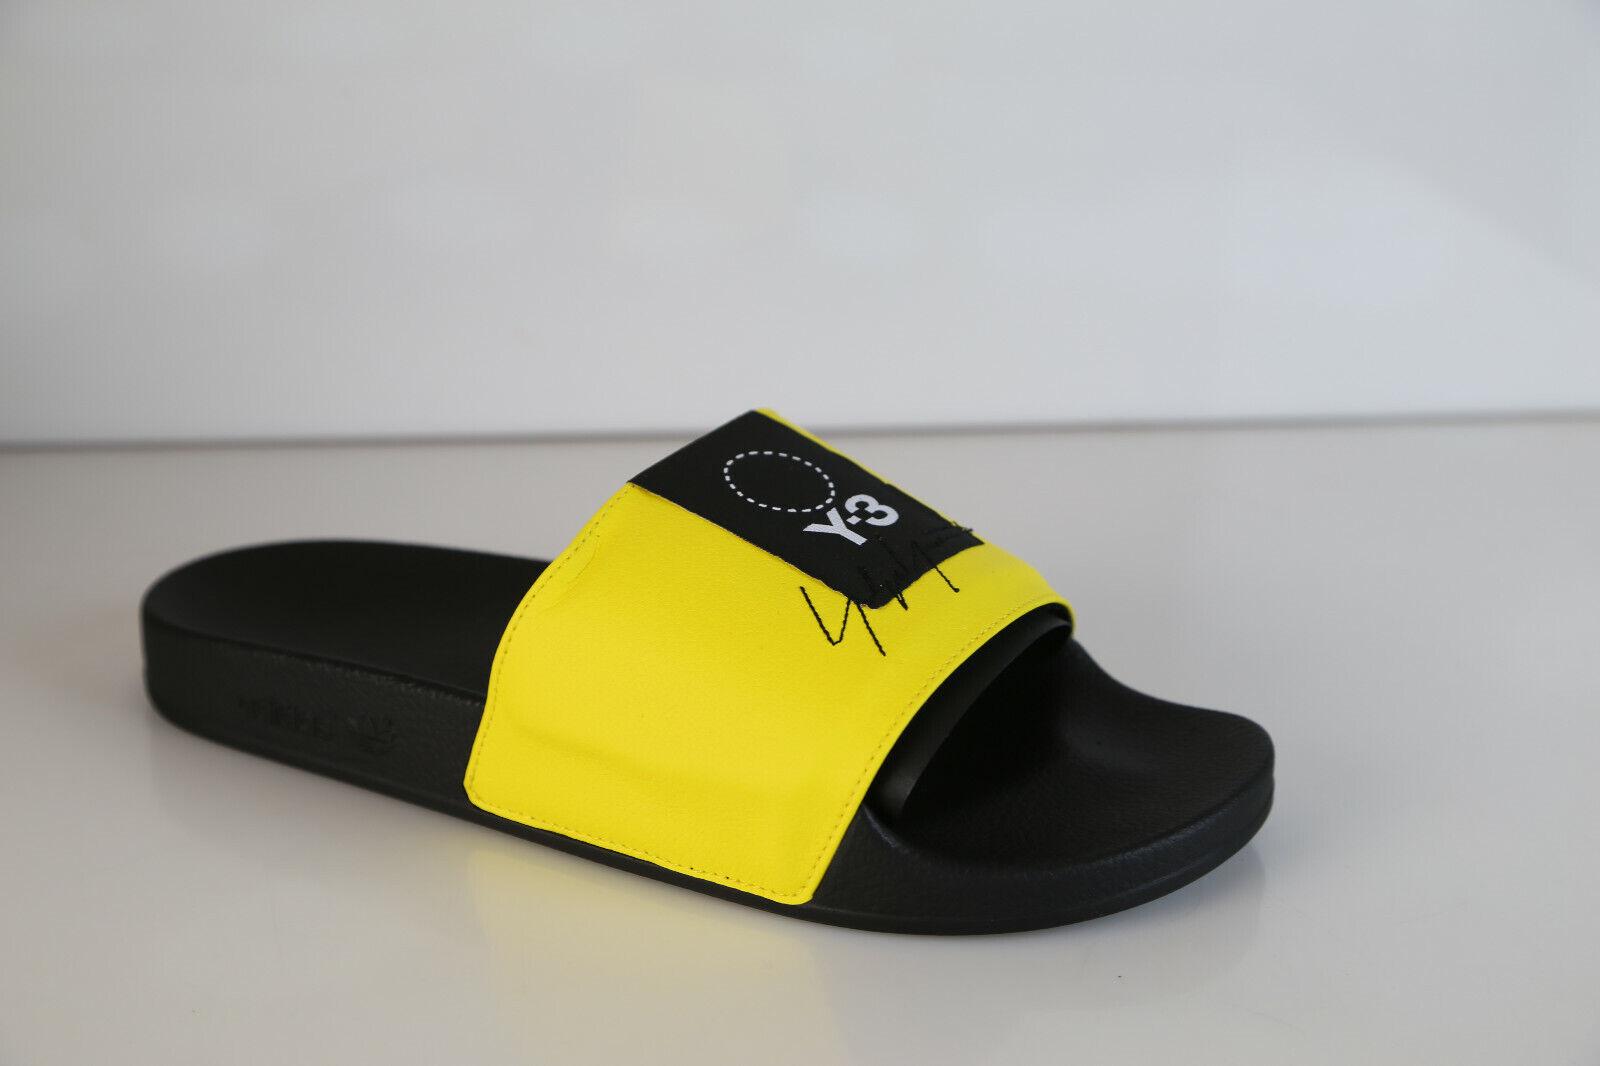 3237ff9525c523 Adidas Y-3 Yohji Yamamoto Adilette Slide Yellow Black Sandal BC0912 8-11